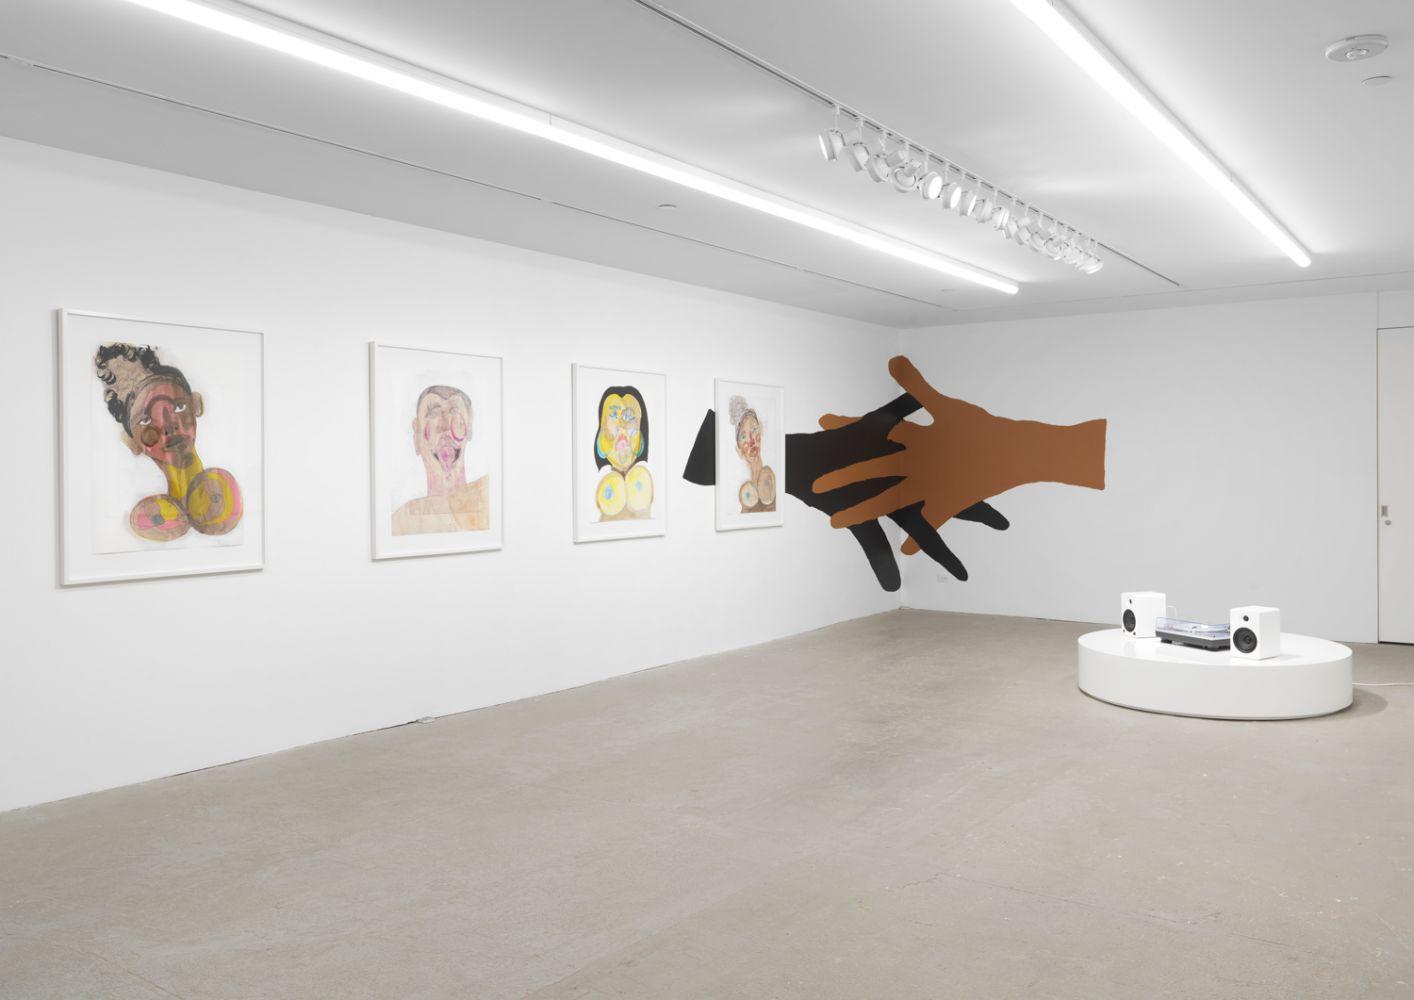 Exhibition View, Tschabalala Self, Cotton Mouth, Eva Presenhuber, New York, 2020 install 14